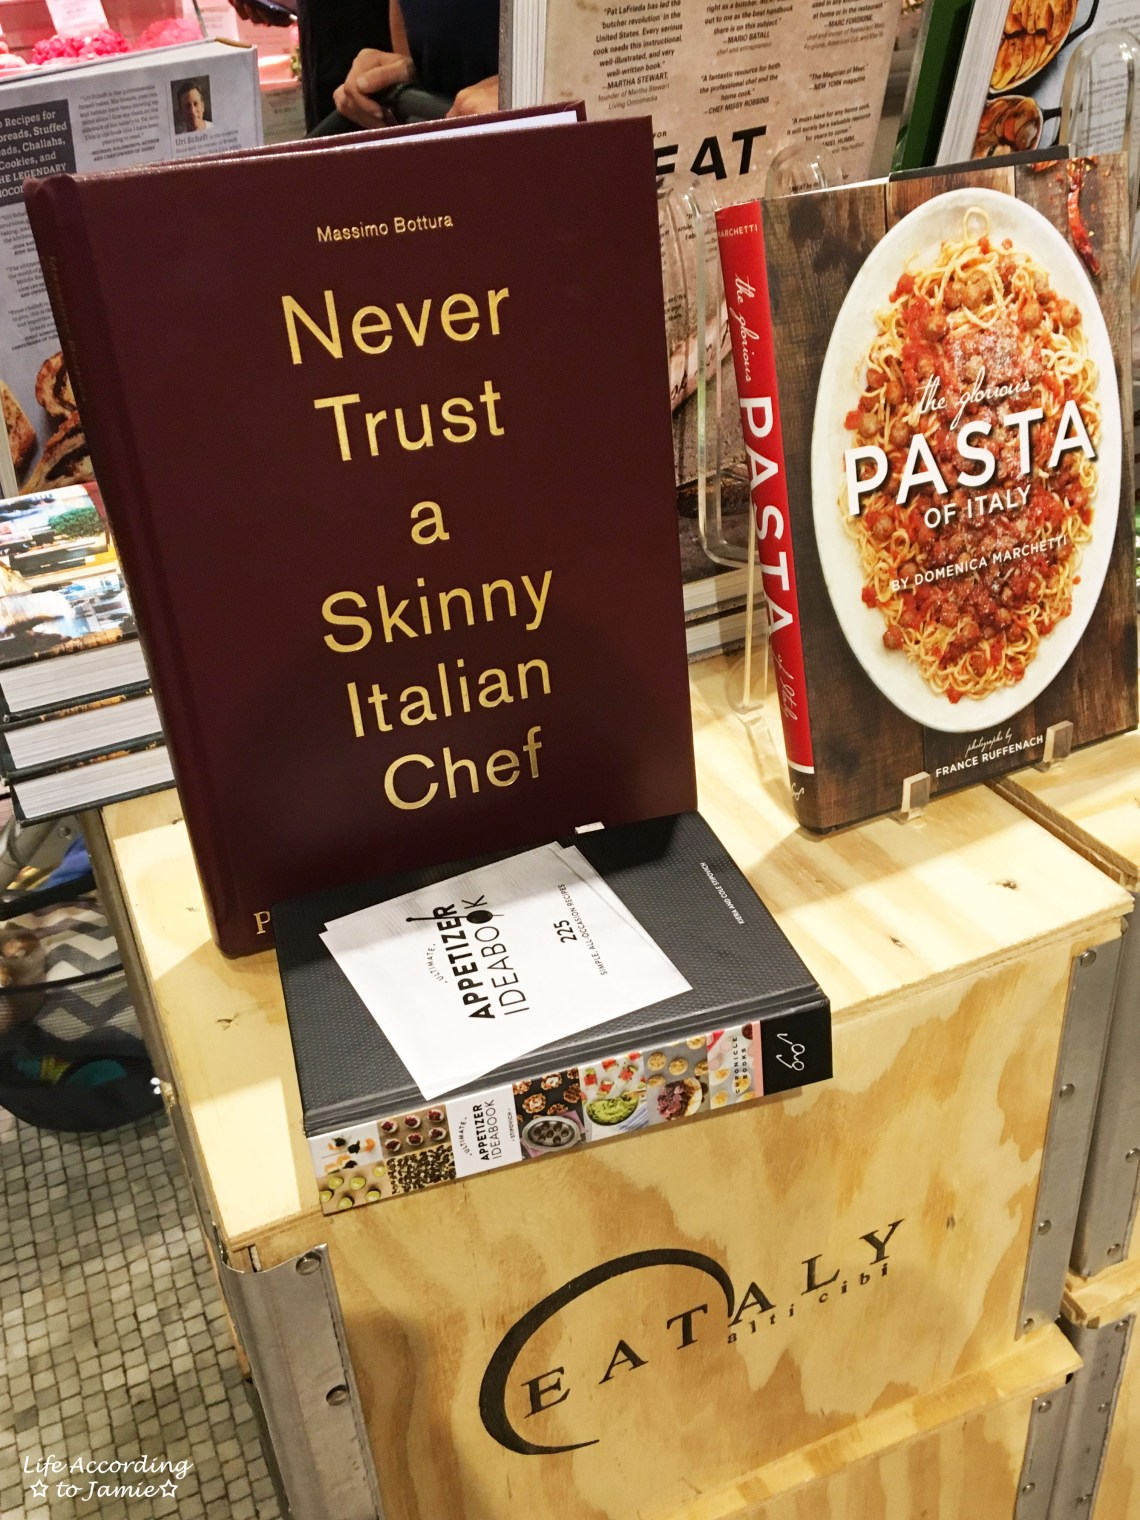 Never Trust a Skinny Italian Chef